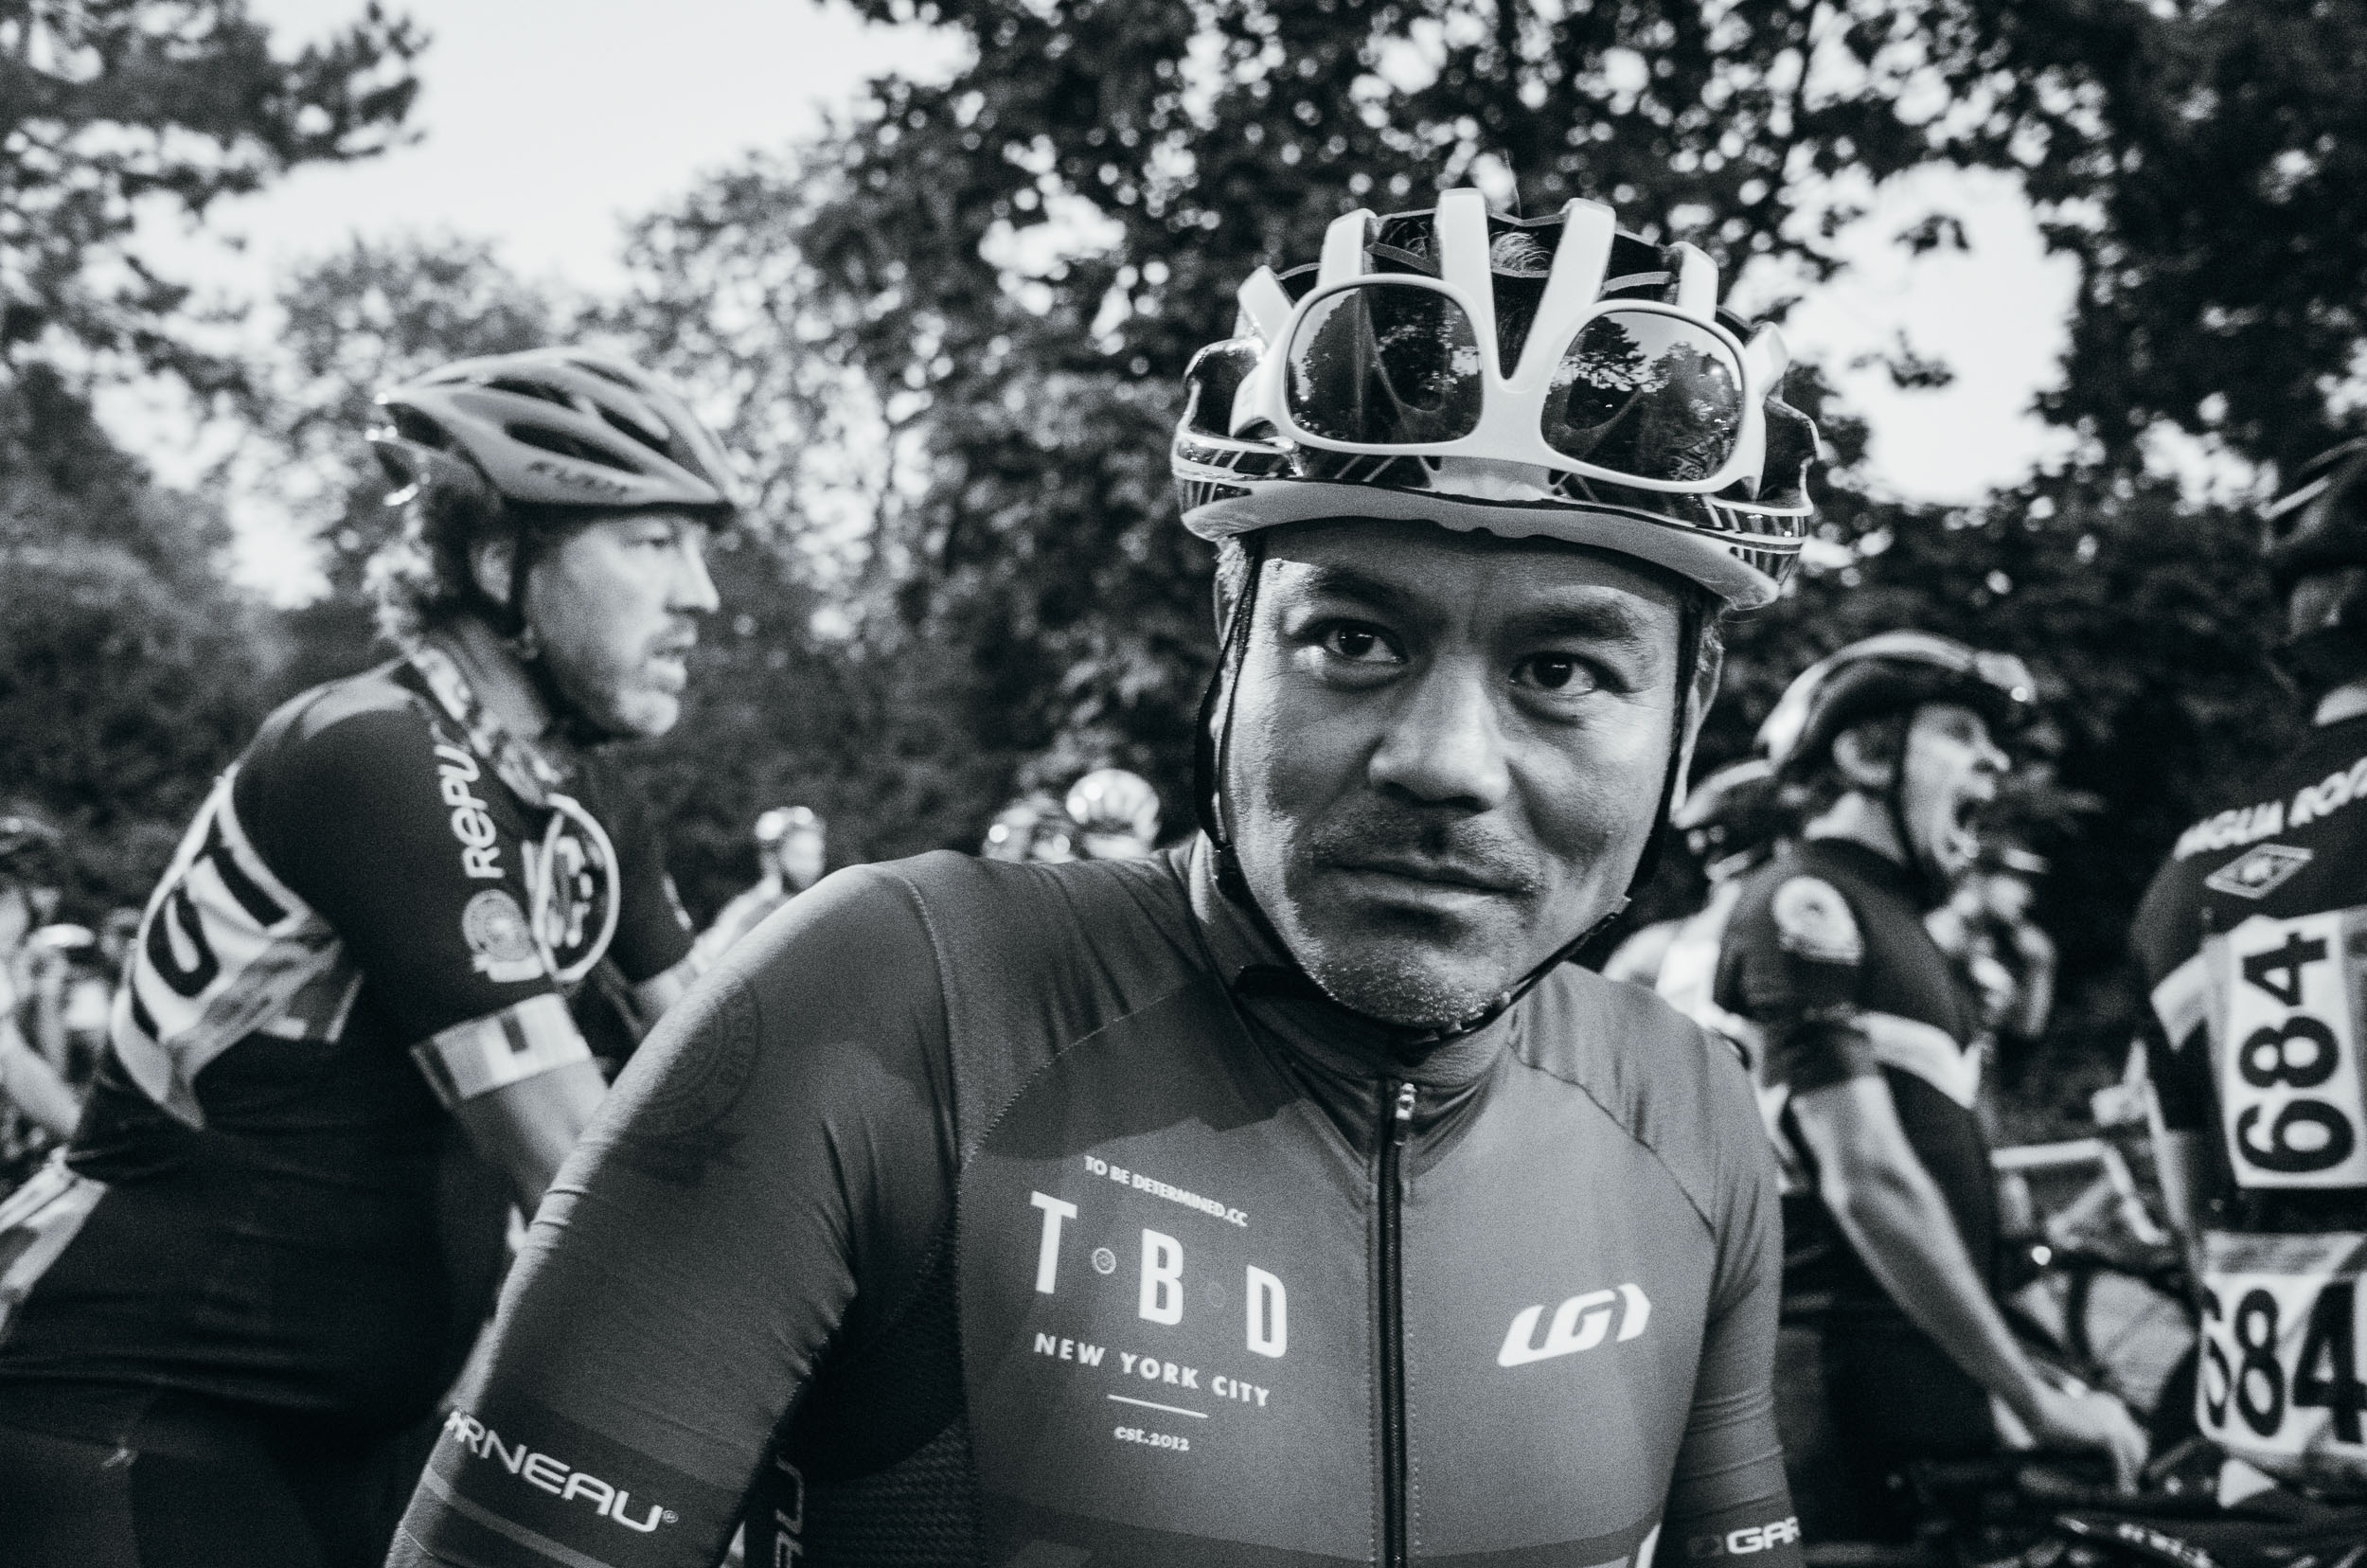 photo-rhetoric-to-be-determined-crca-club-race-113.jpg